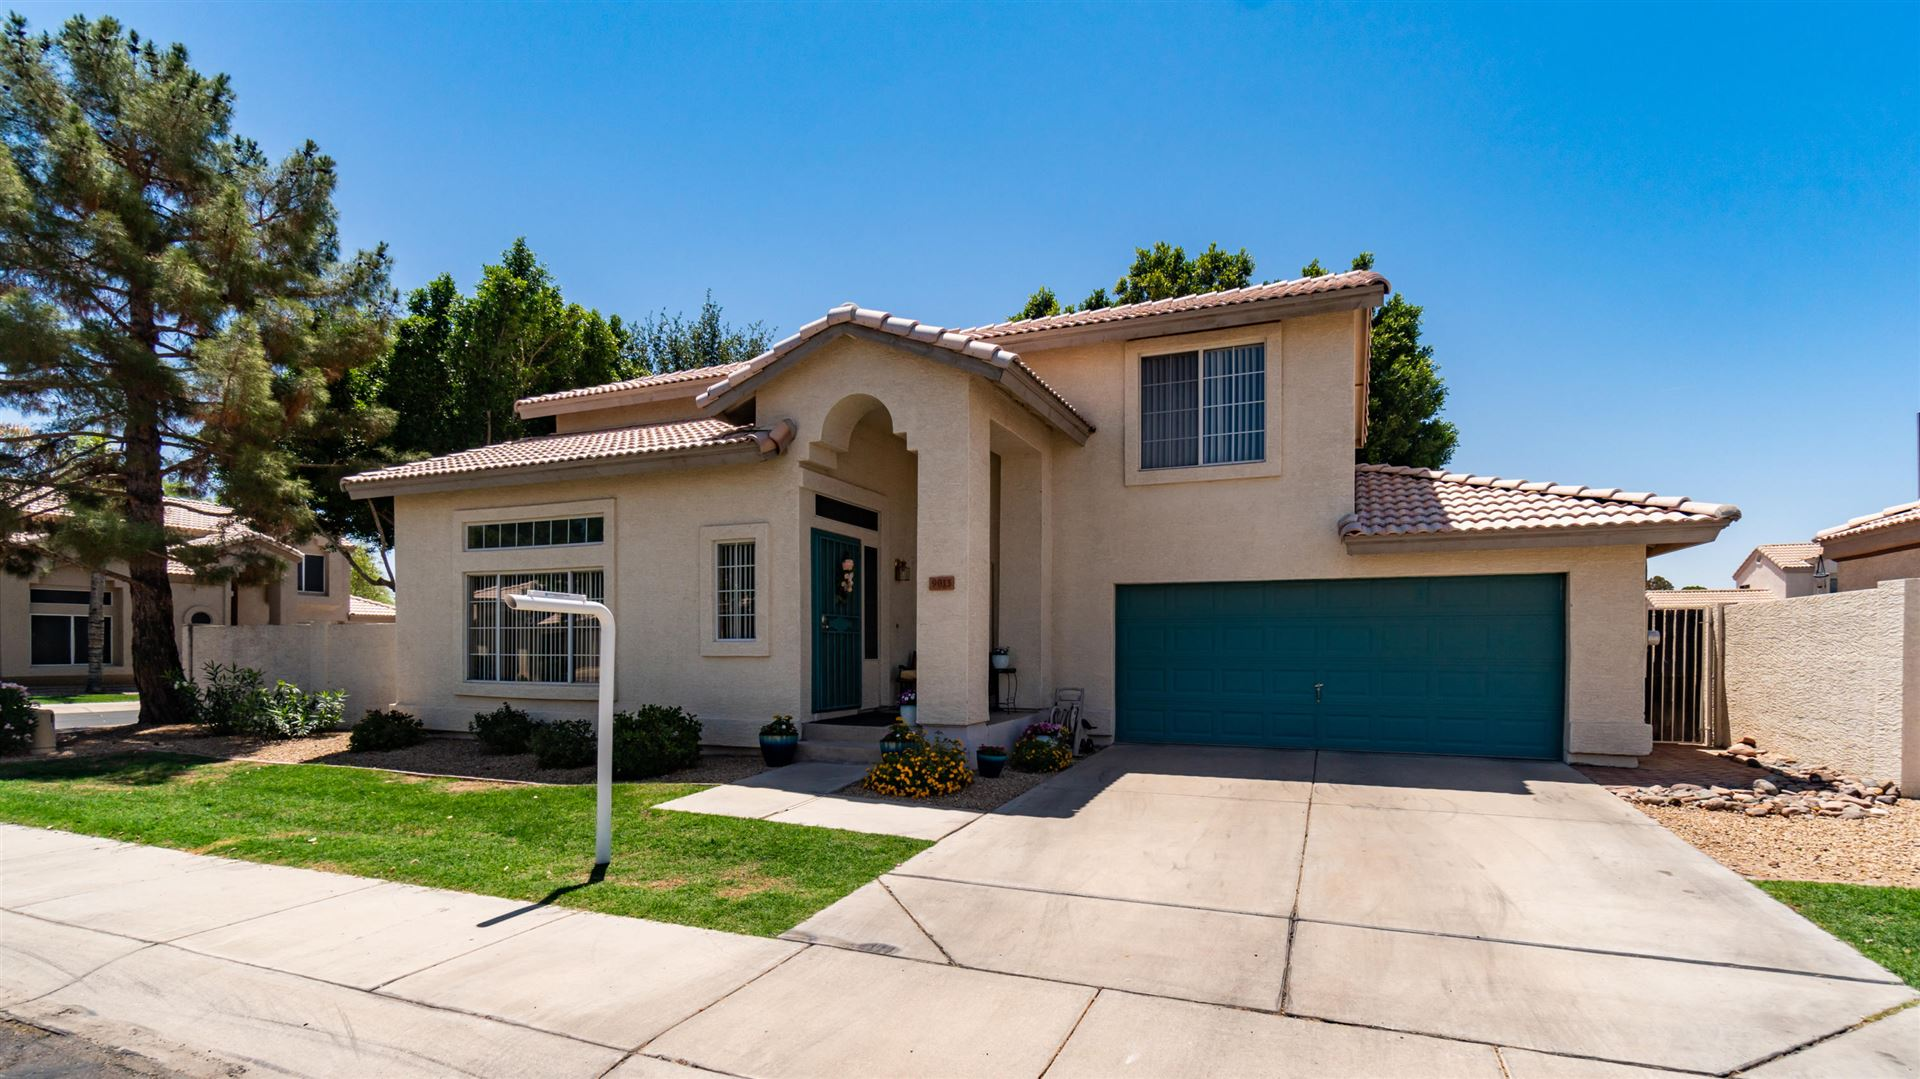 9013 W PORT AU PRINCE Lane, Peoria, AZ 85381 - MLS#: 6235127